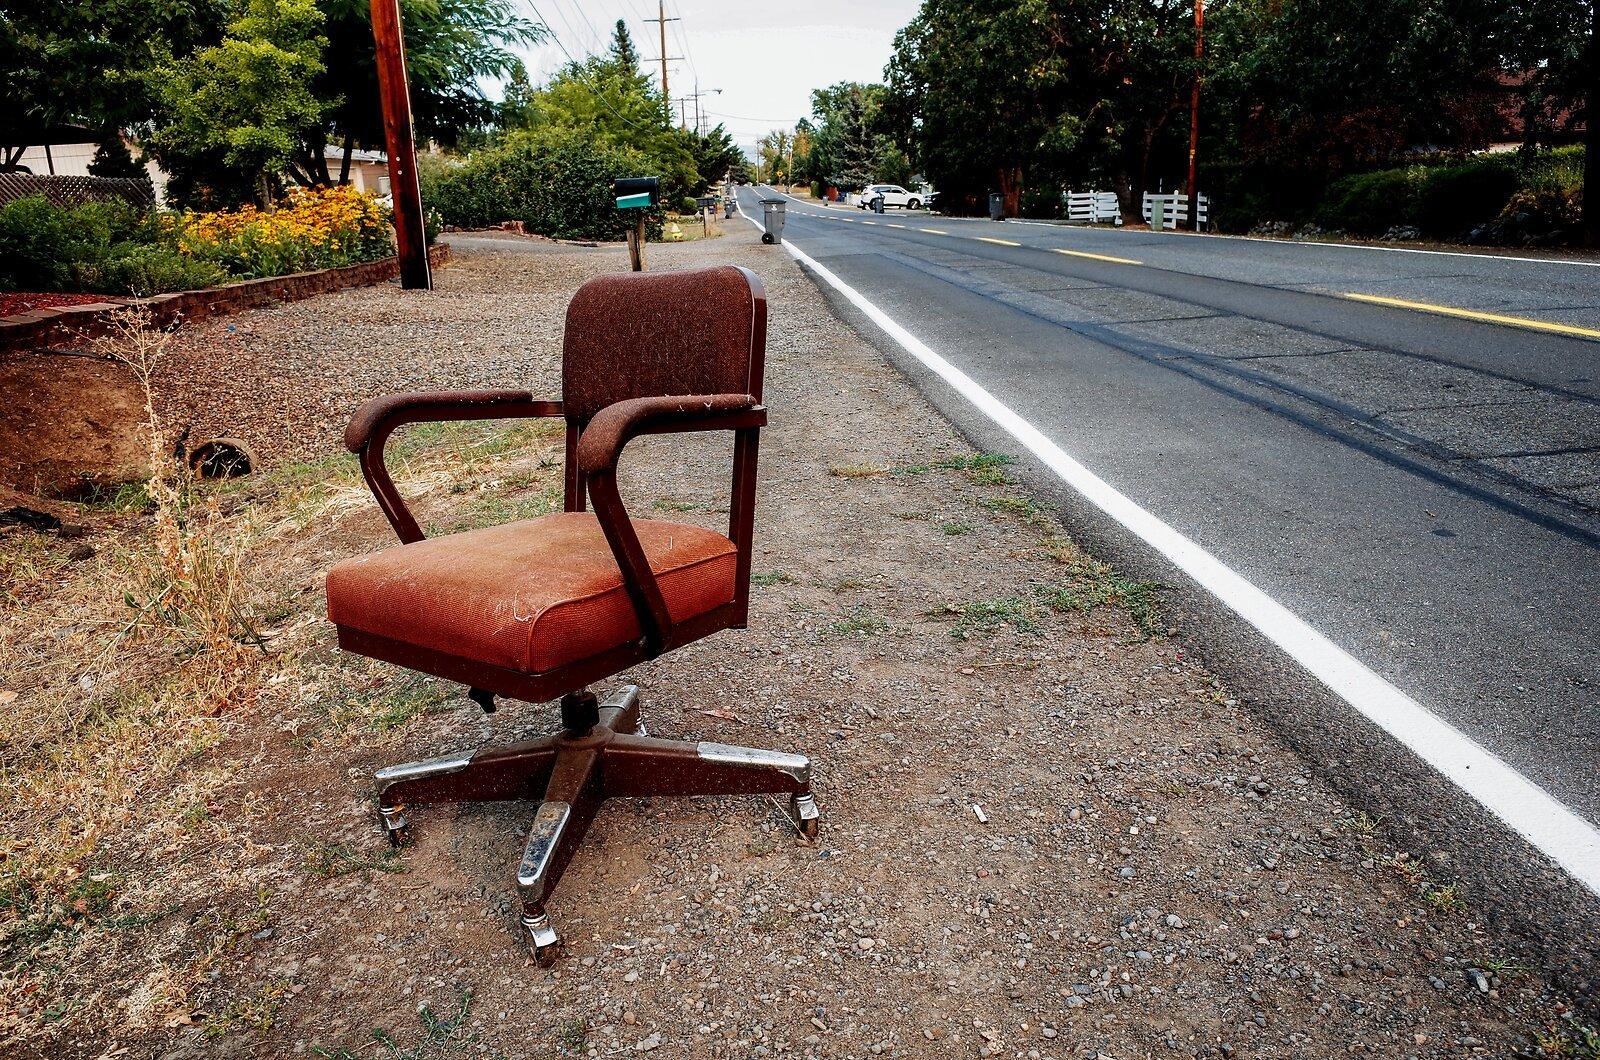 GRII_Aug26_Abandoned_chair.jpg